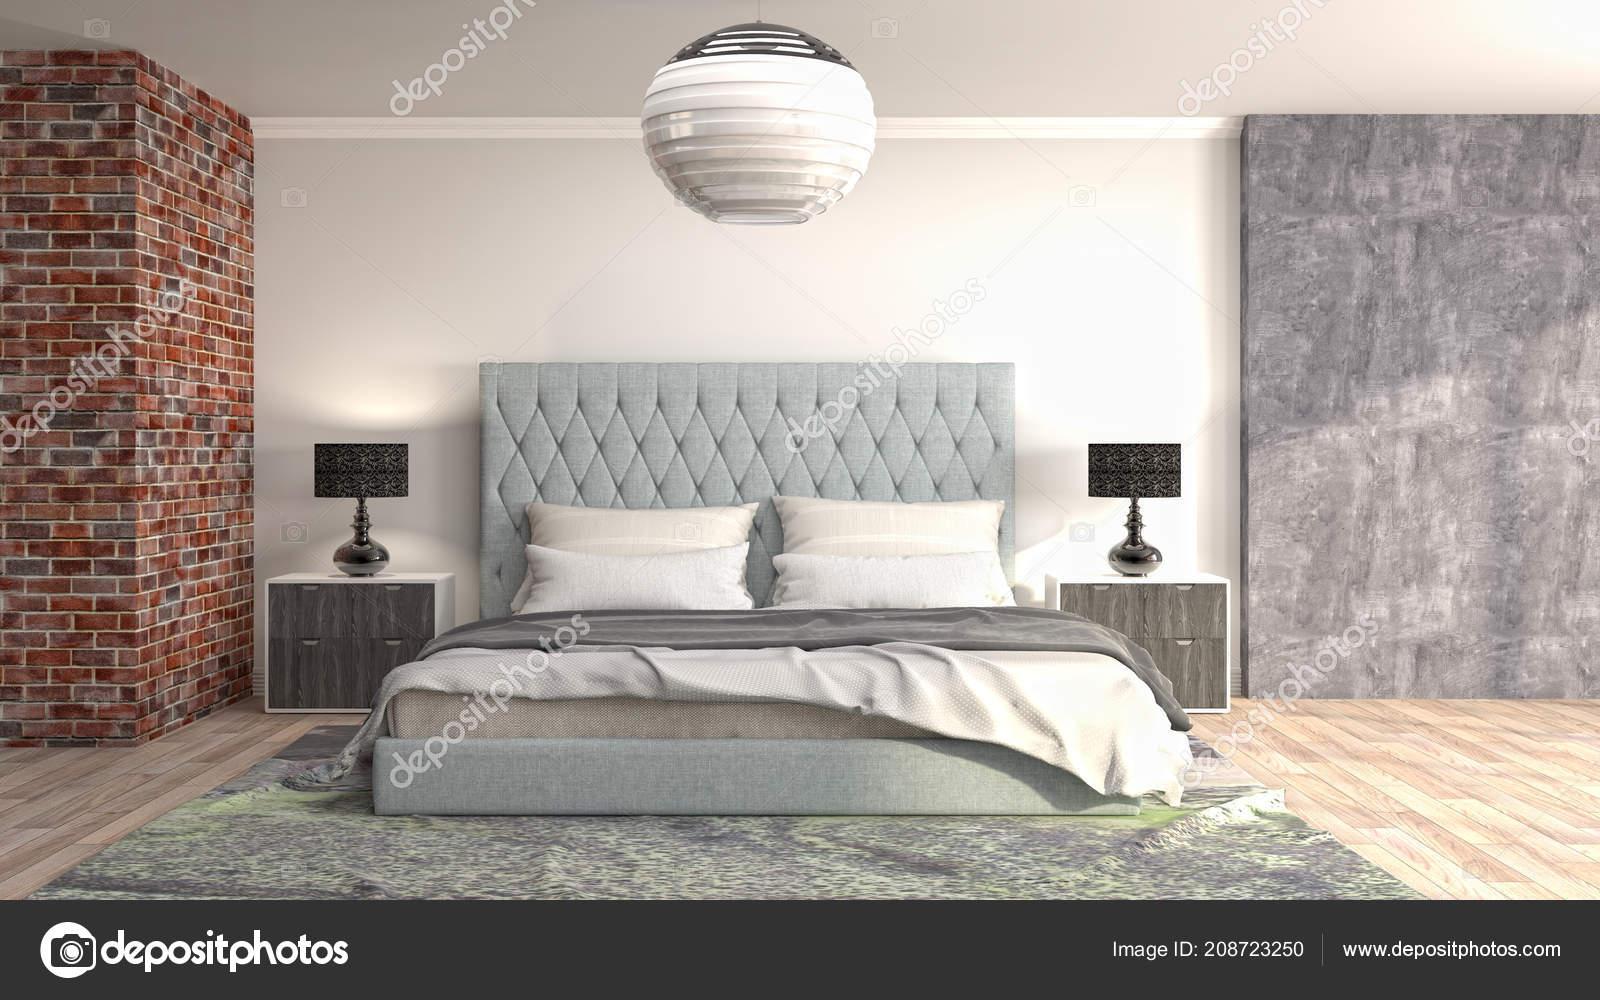 Slaapkamer Interieur Illustratie — Stockfoto © StockerNumber2 #208723250